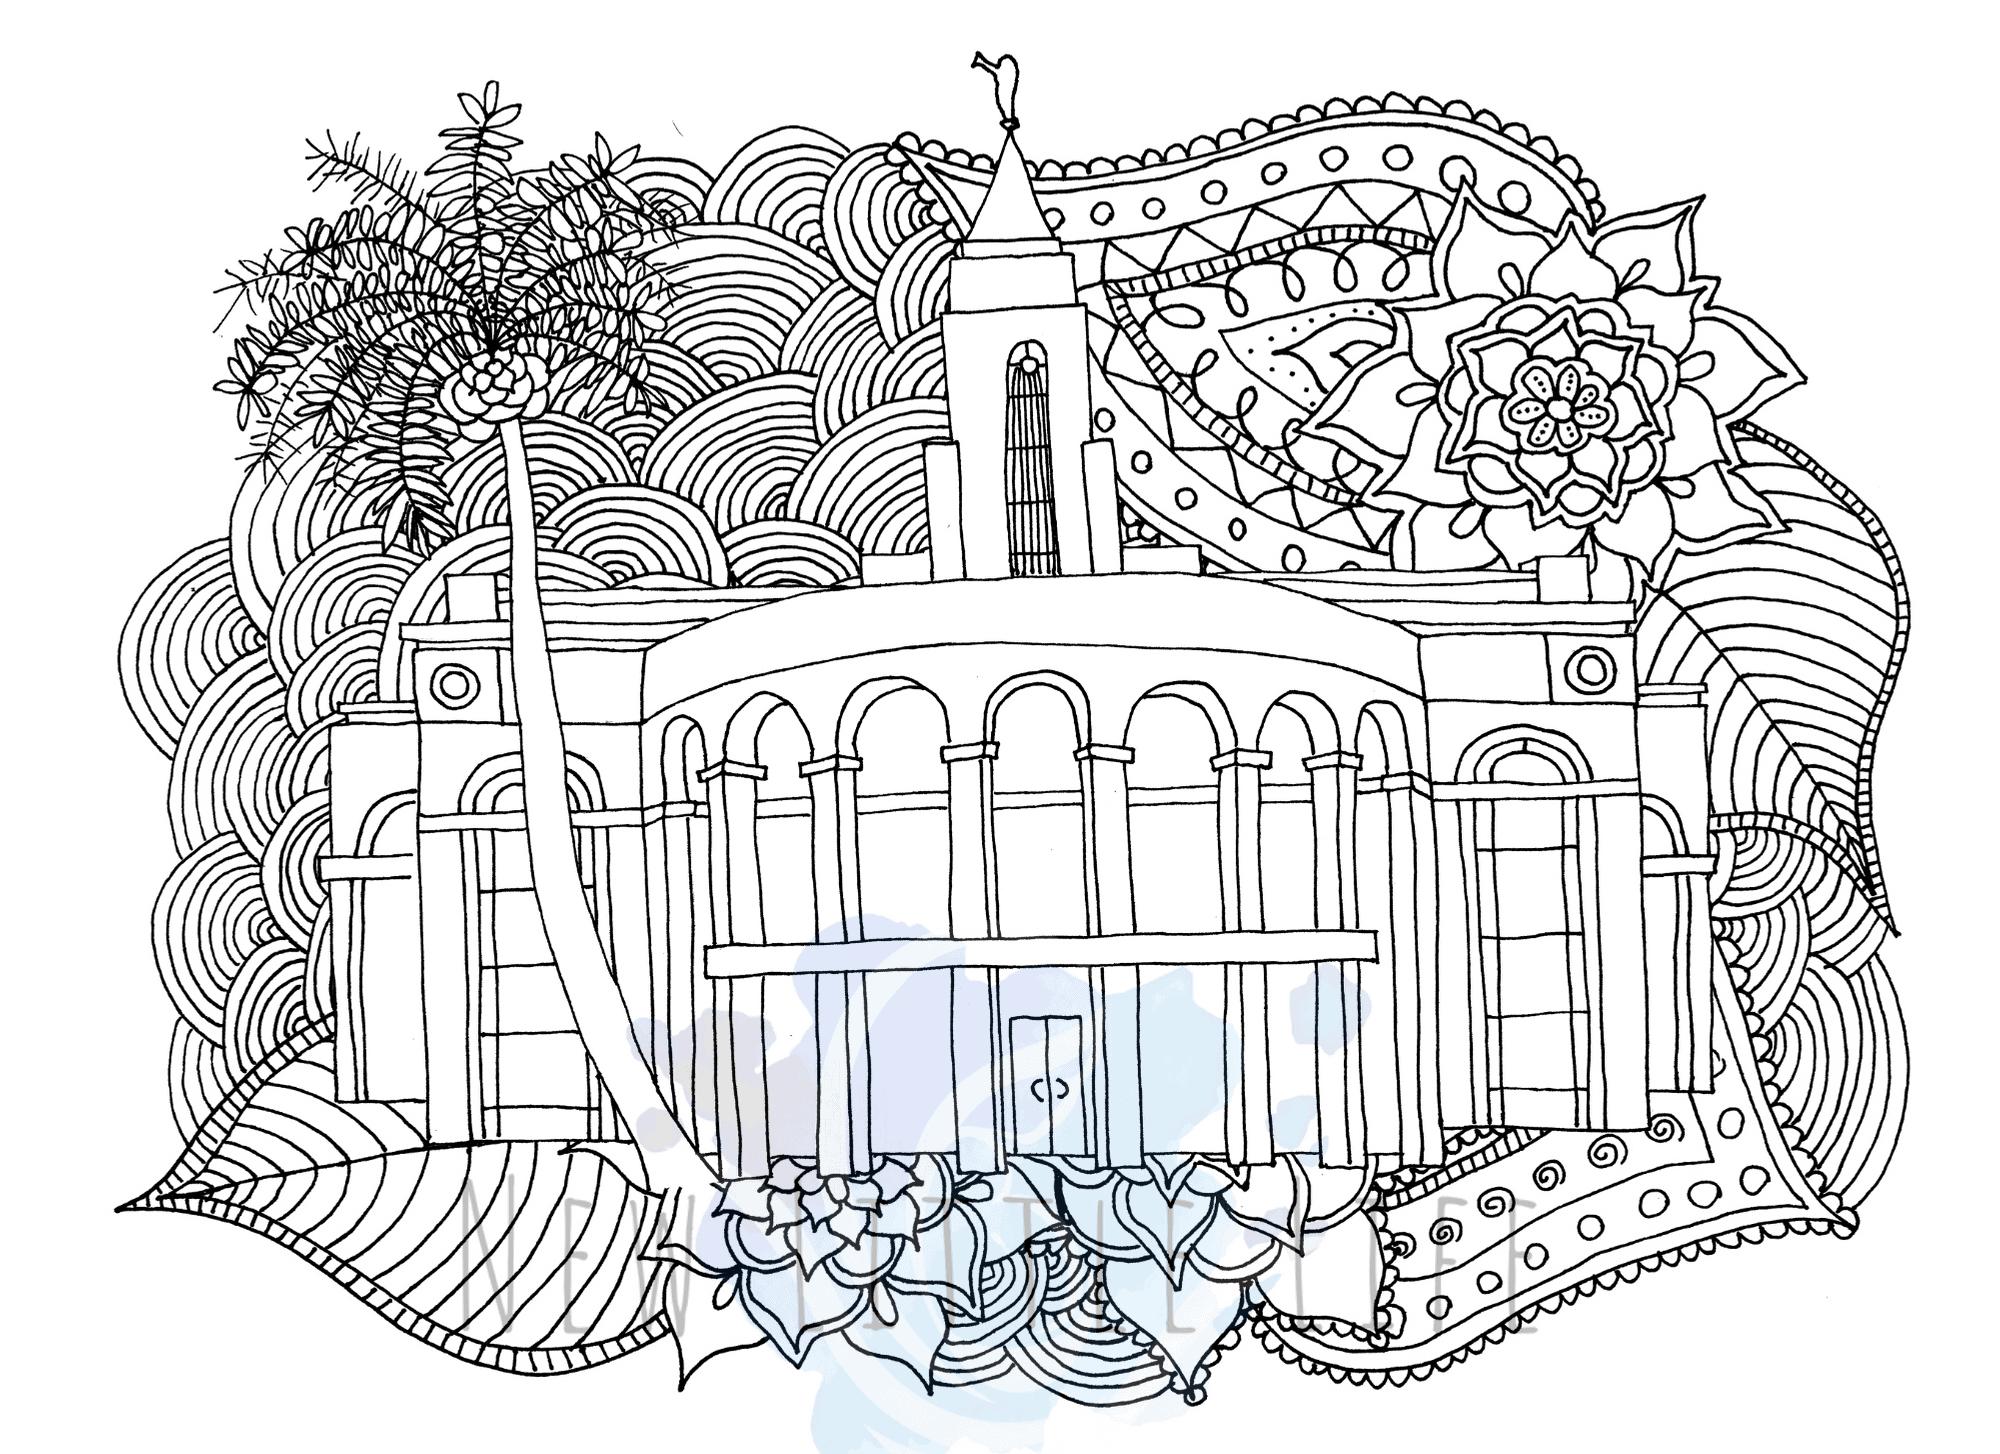 Untitled design (25)